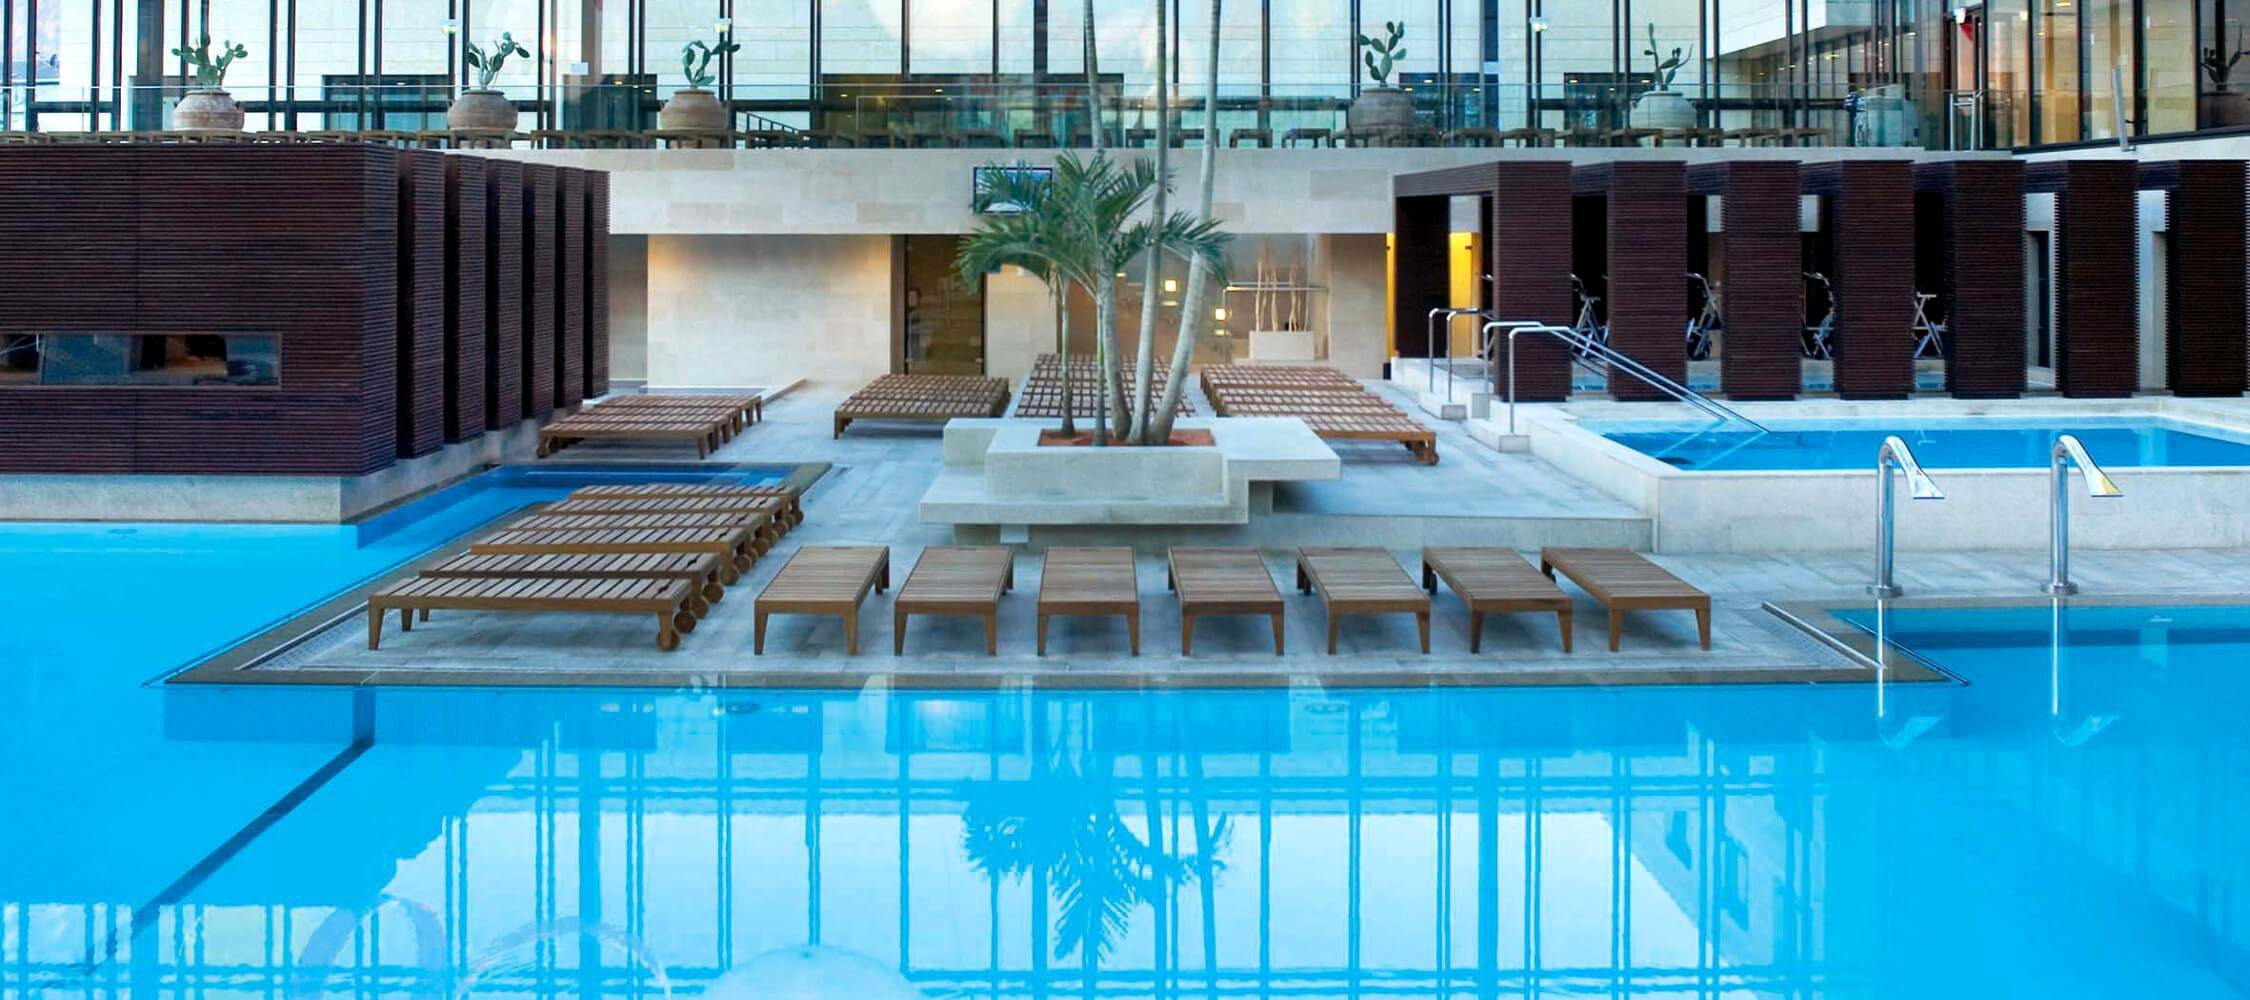 Italien-Trentino_Suedtirol_Alto_Adige_Merano_Meran_Therme_Pool_Badehalle_Schwimmbad_Trend_2250x1000